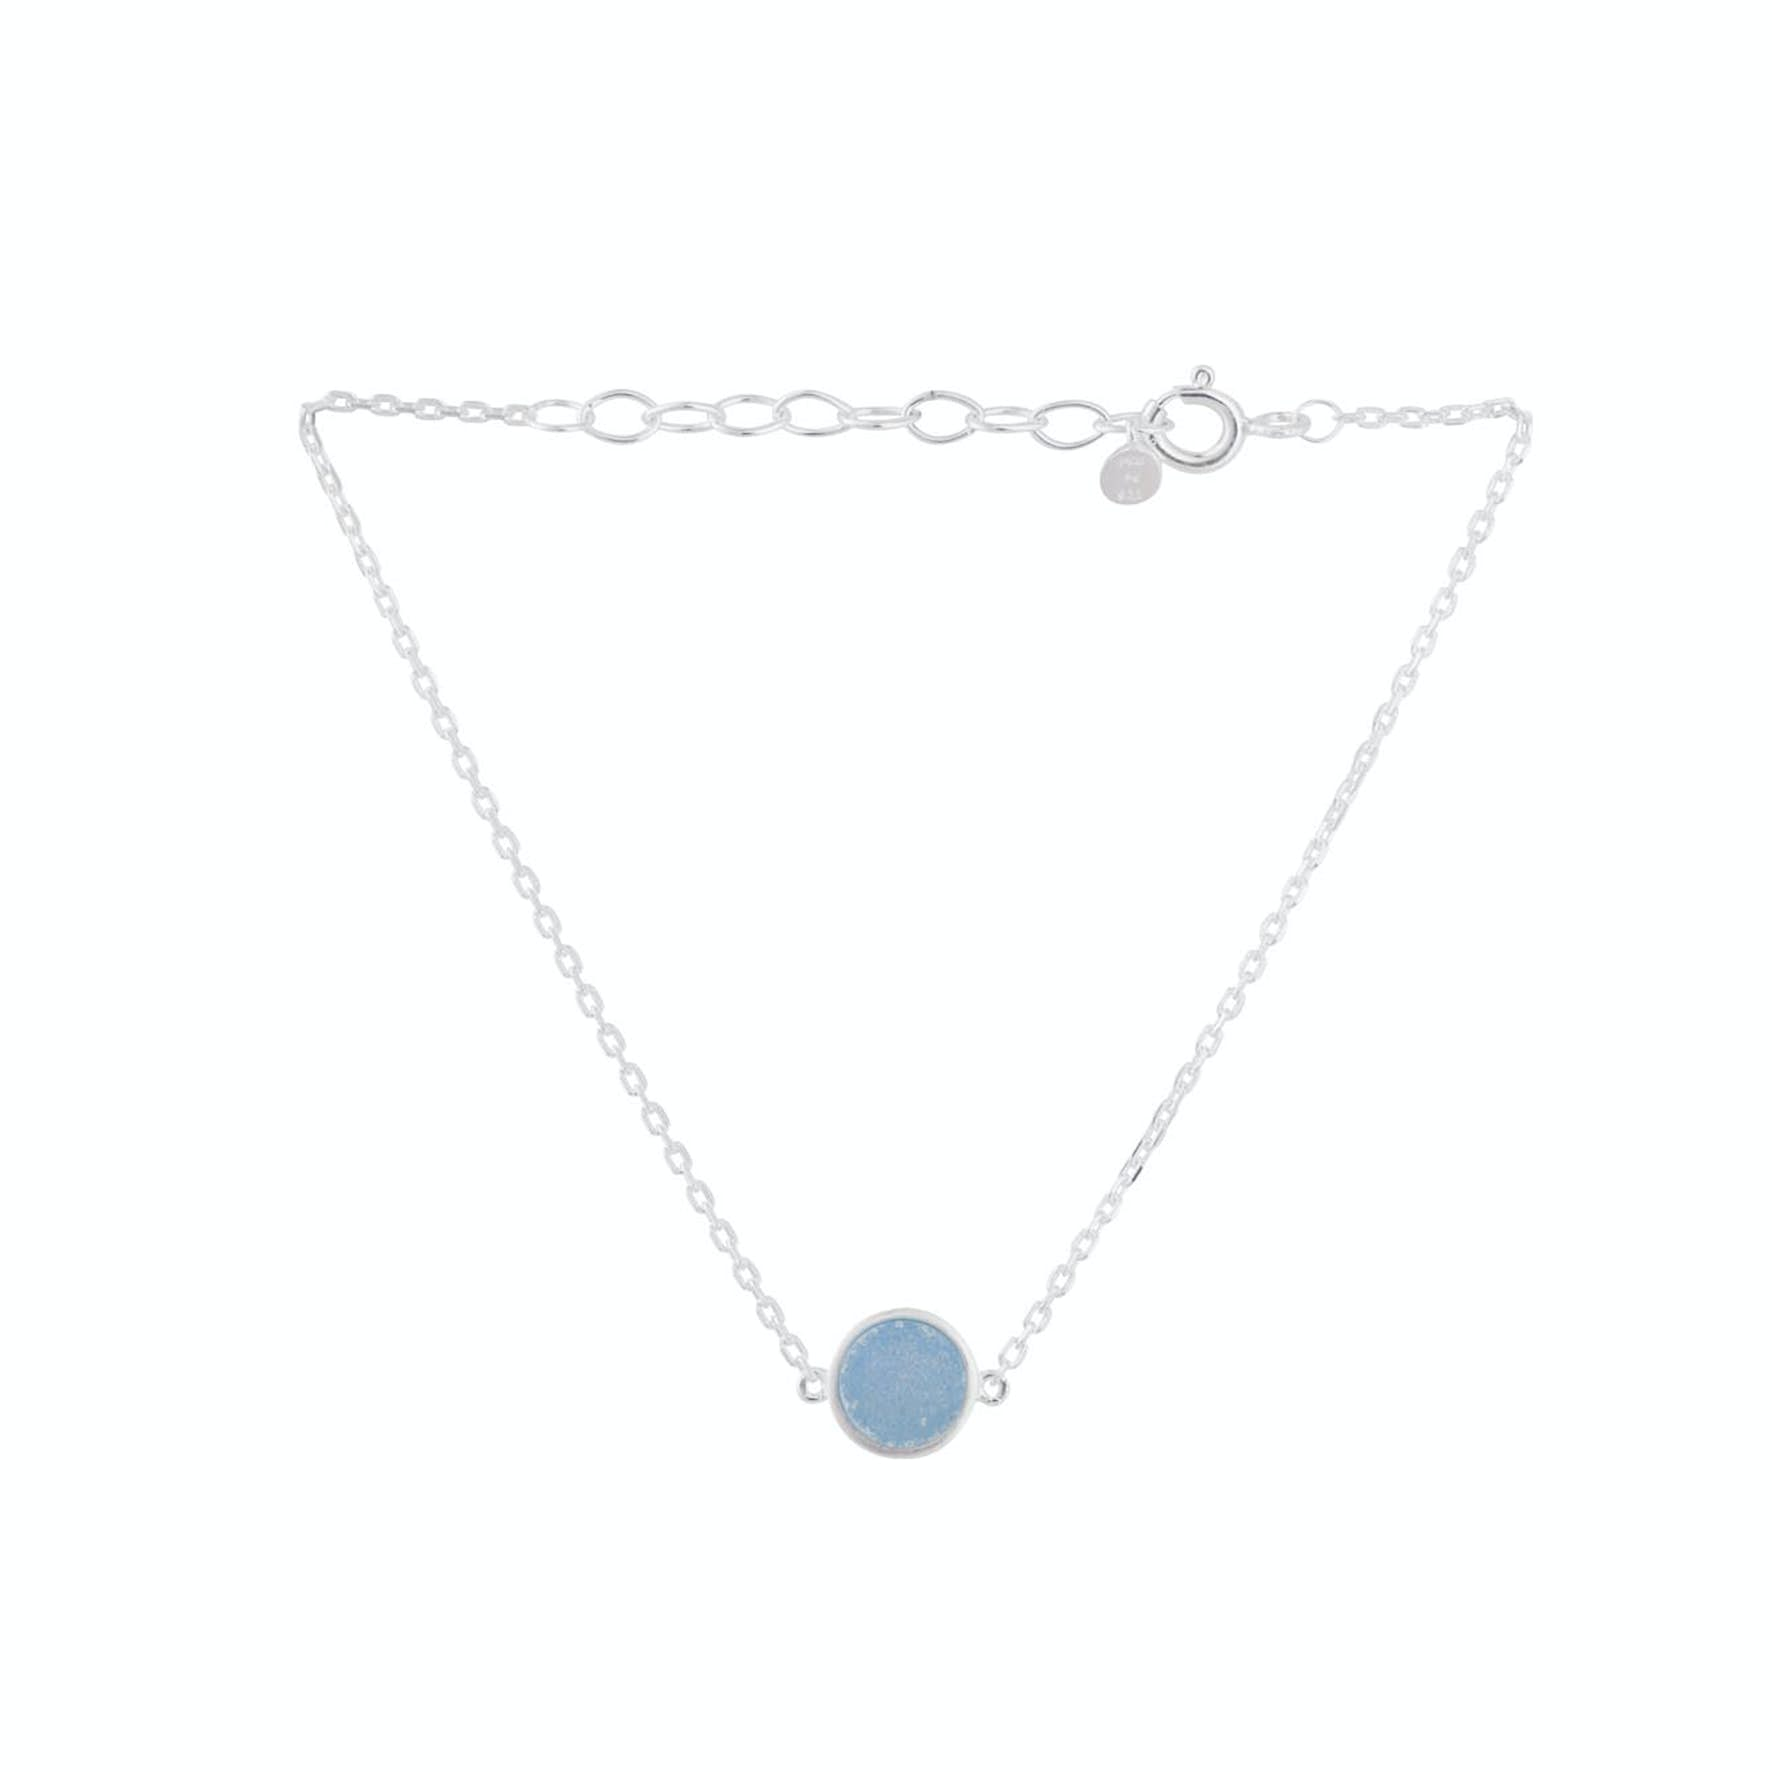 Shallow Bracelet von Pernille Corydon in Silber Sterling 925